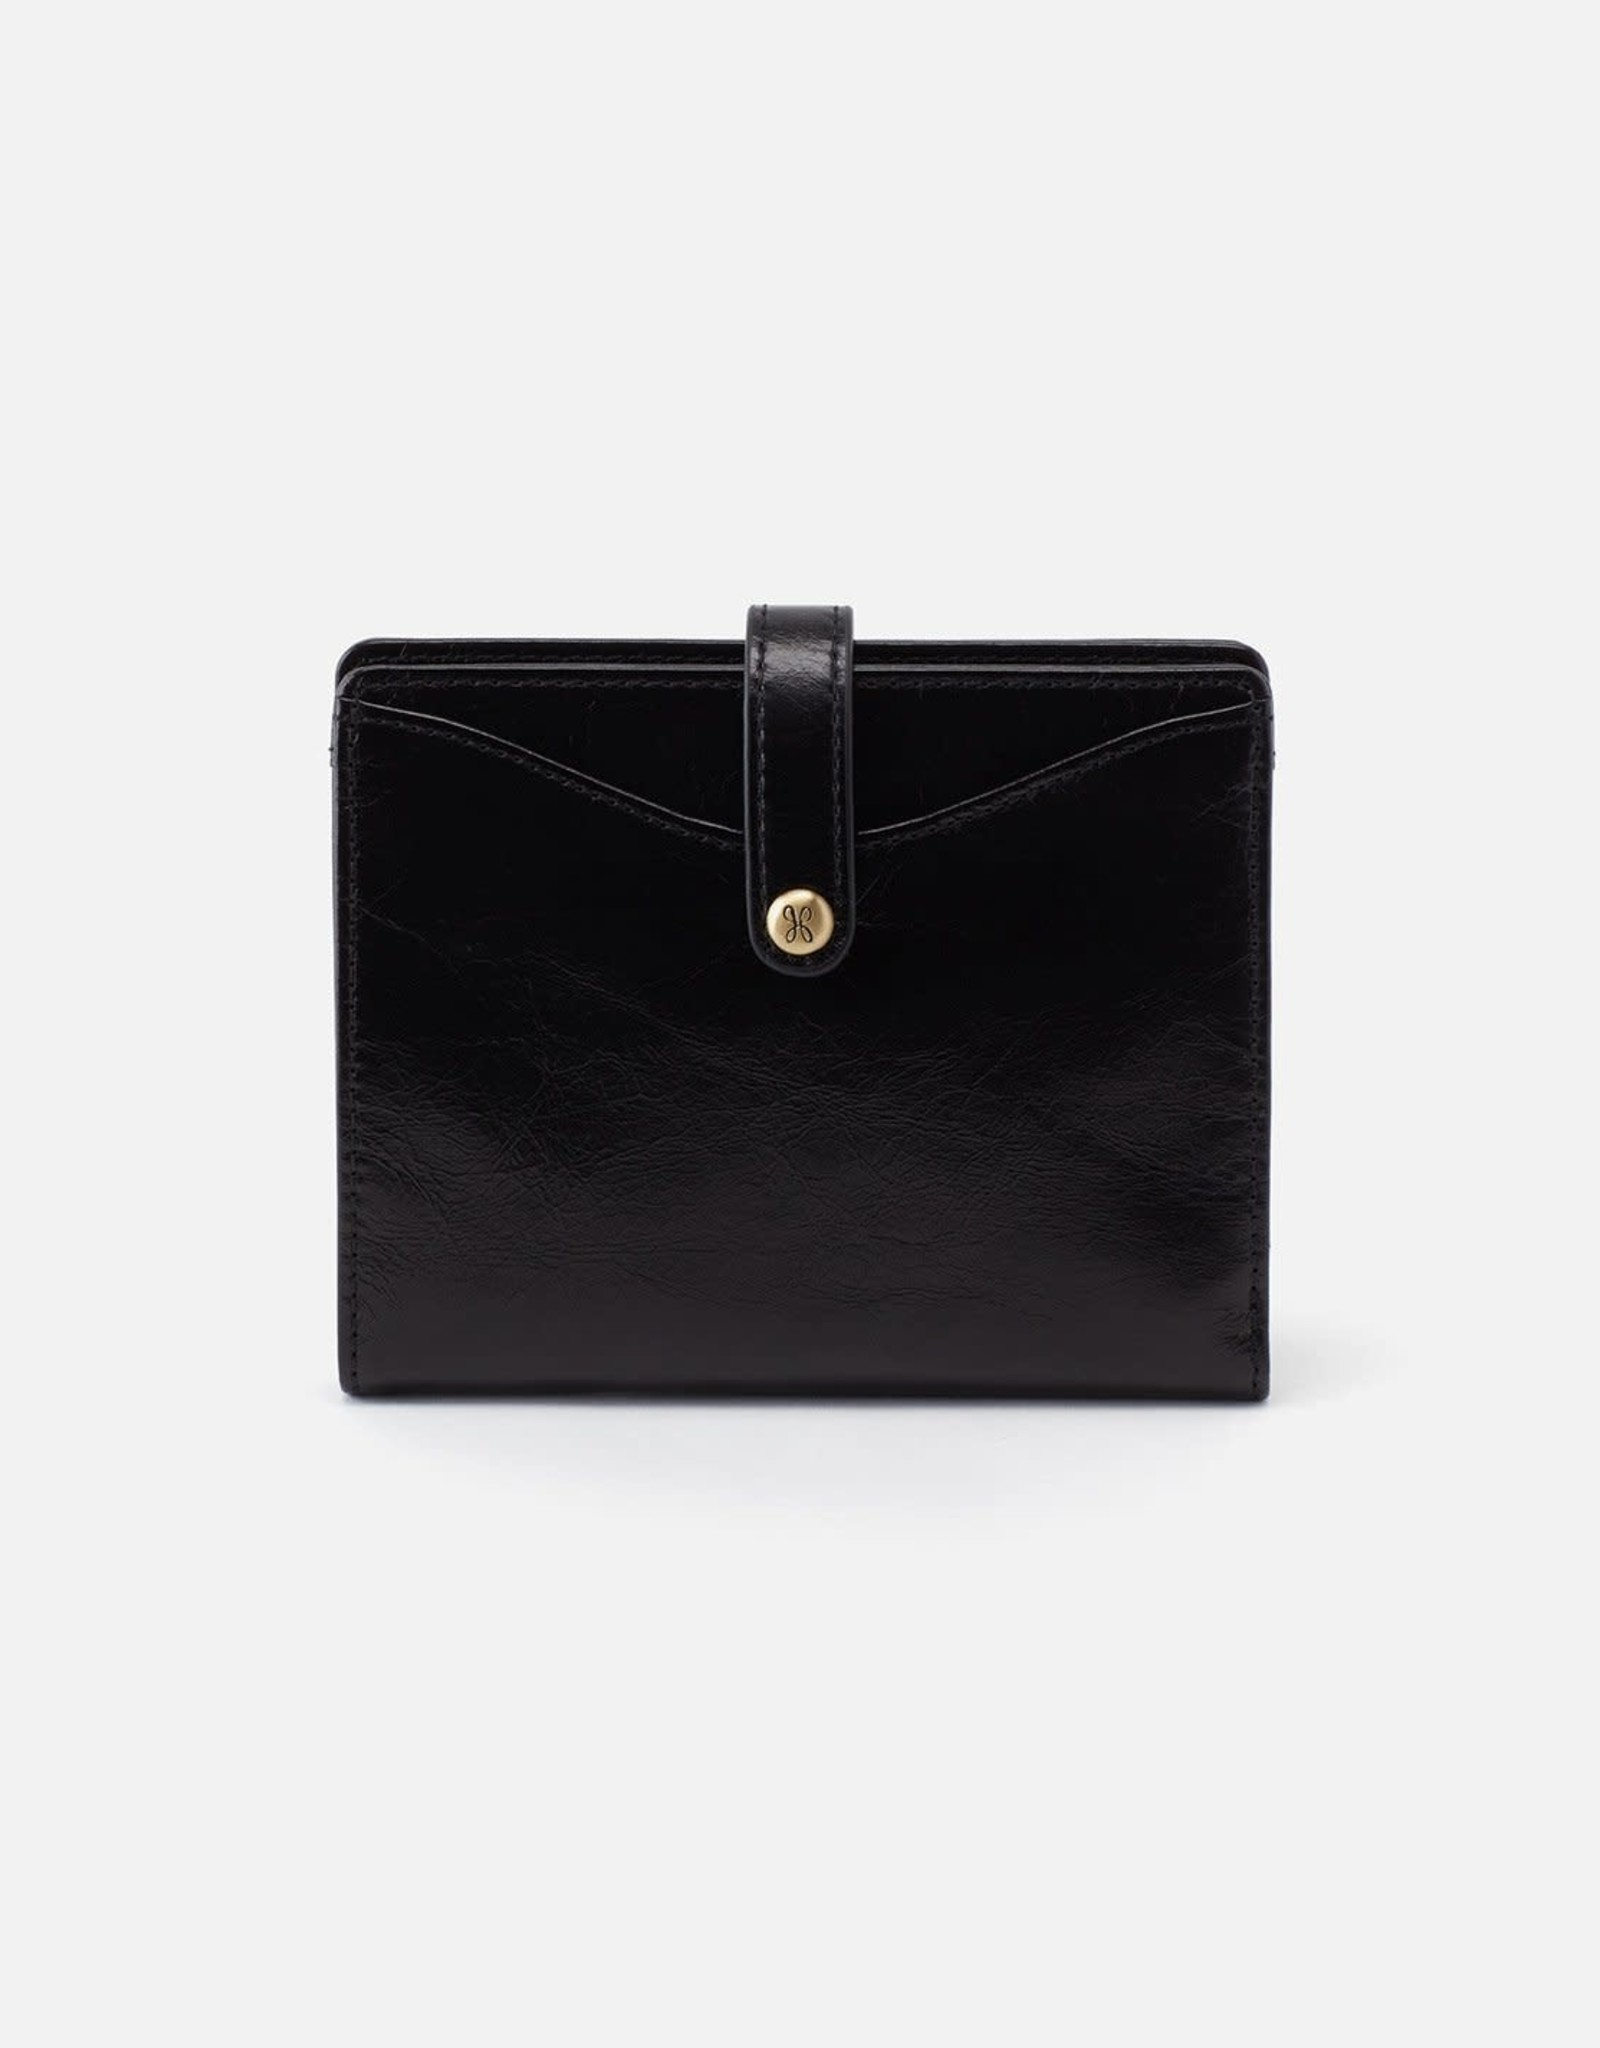 Hobo International Hobo Lift Black Wallet